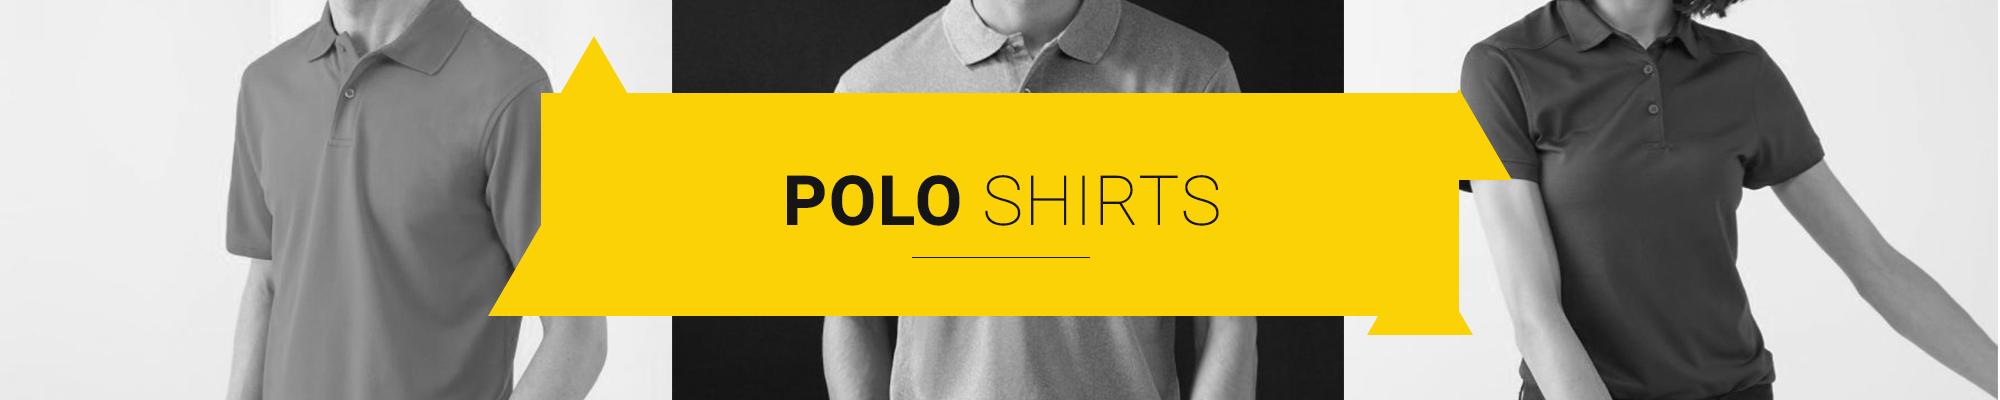 Polo Shirts Banner